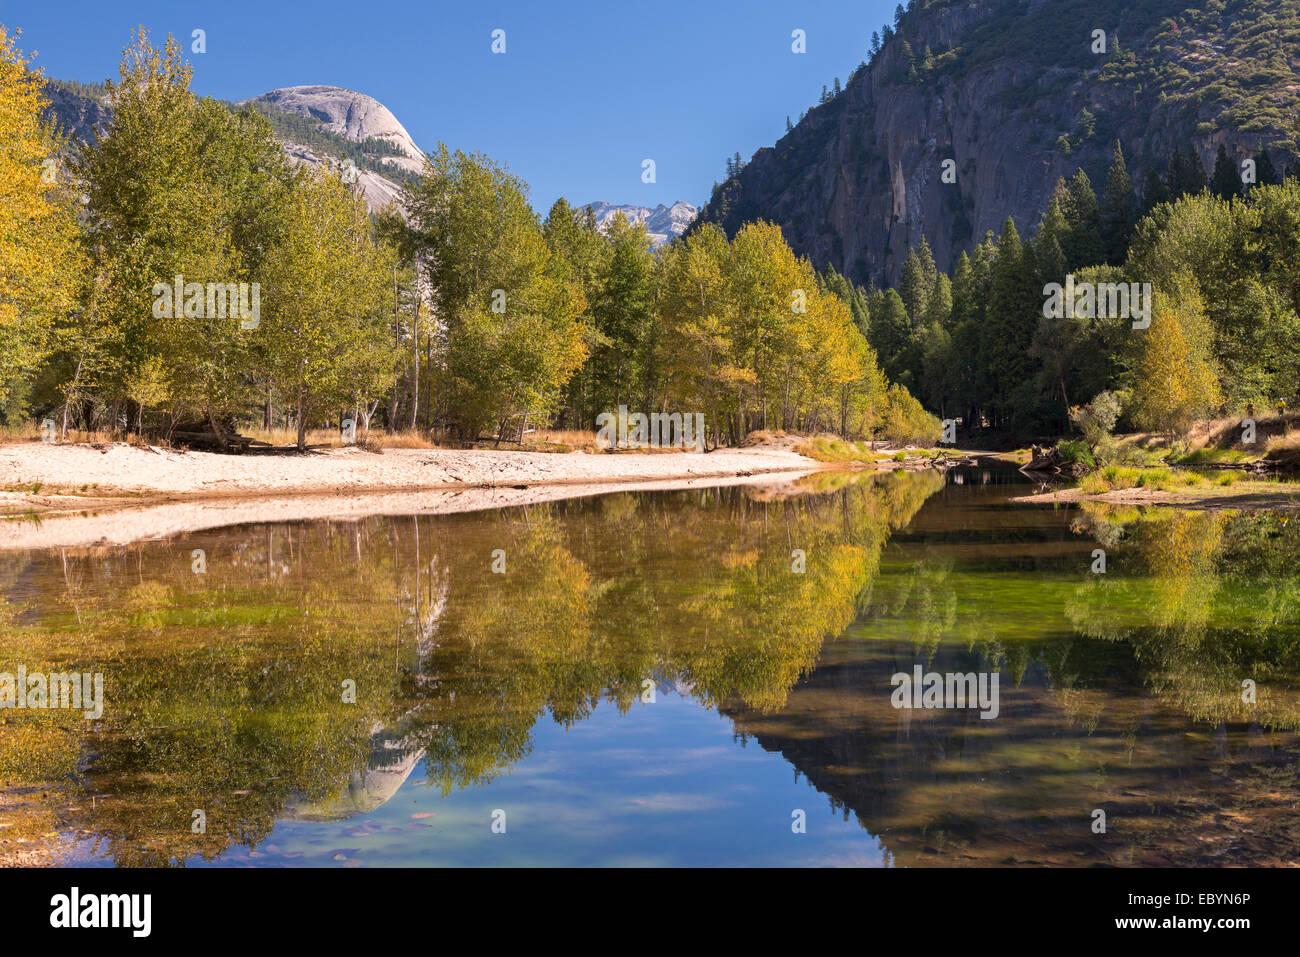 Herbstfärbung an den Ufern des Flusses Merced, Yosemite Valley, Kalifornien, USA. Herbst (Oktober) 2014. Stockbild